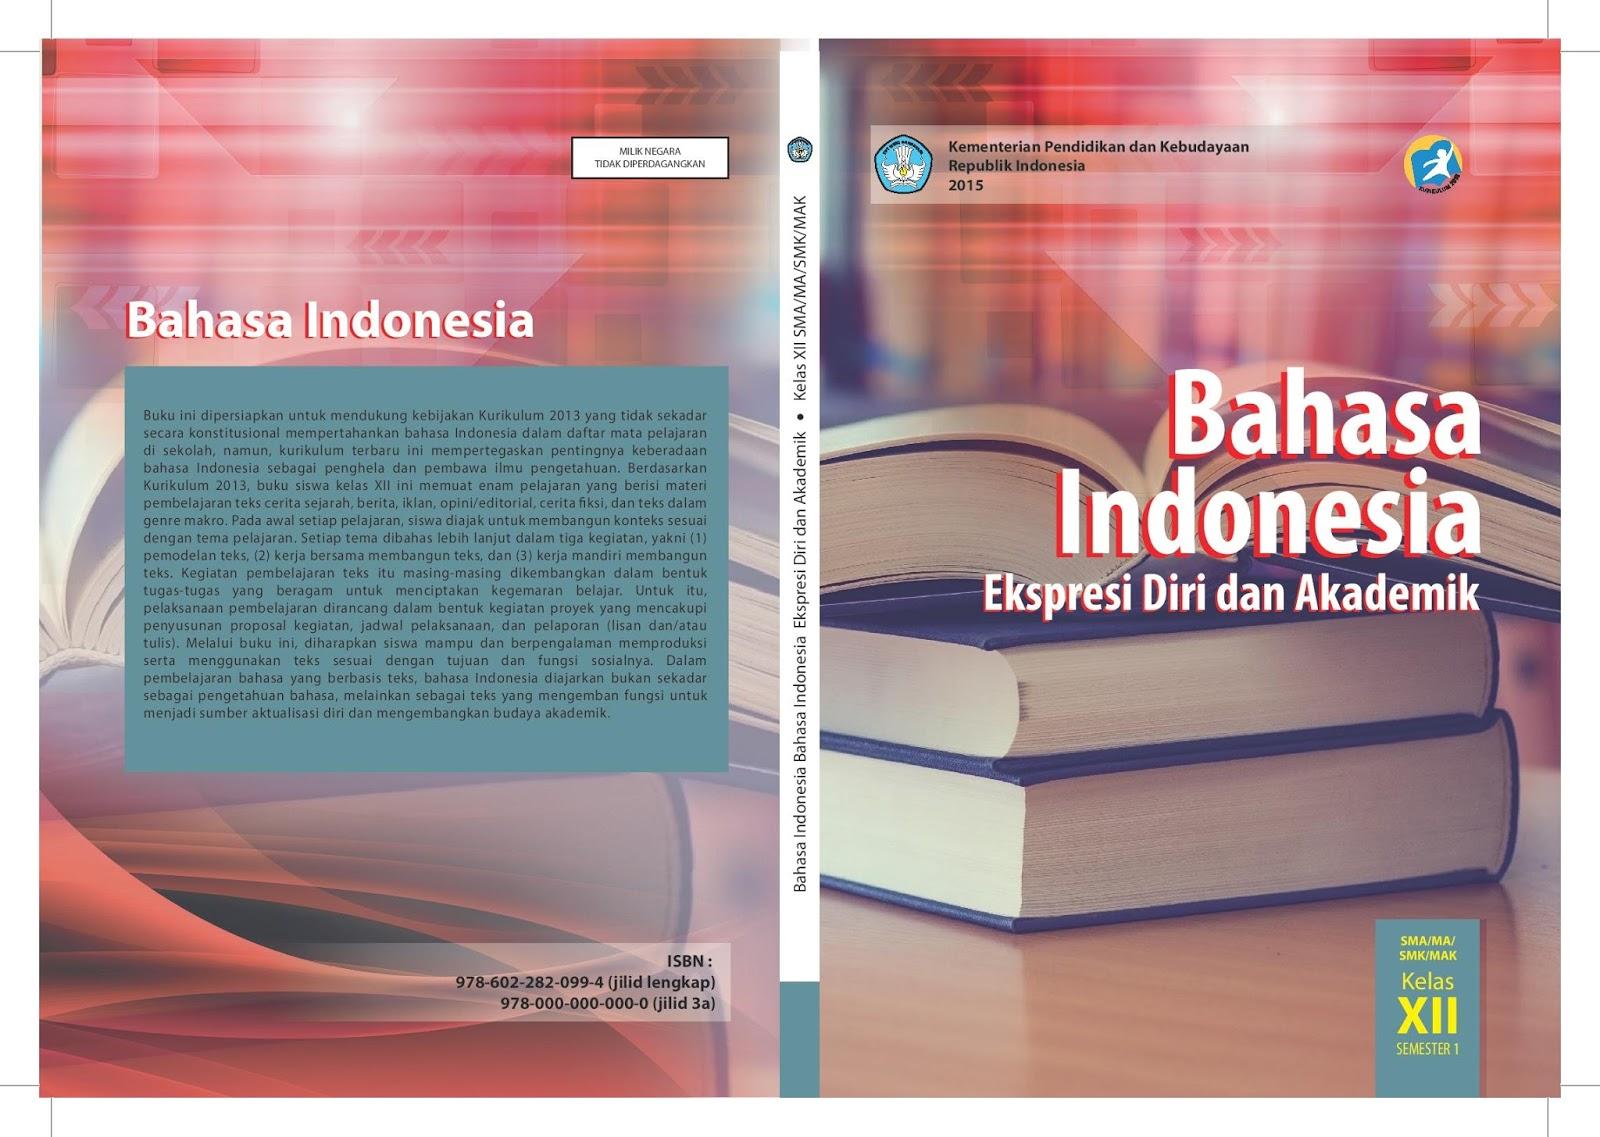 Tugas Bahasa Indonesia Kelas Xii Halaman 33 Buku Paket Semester 1 Kurikulum 2013 Agan Blog